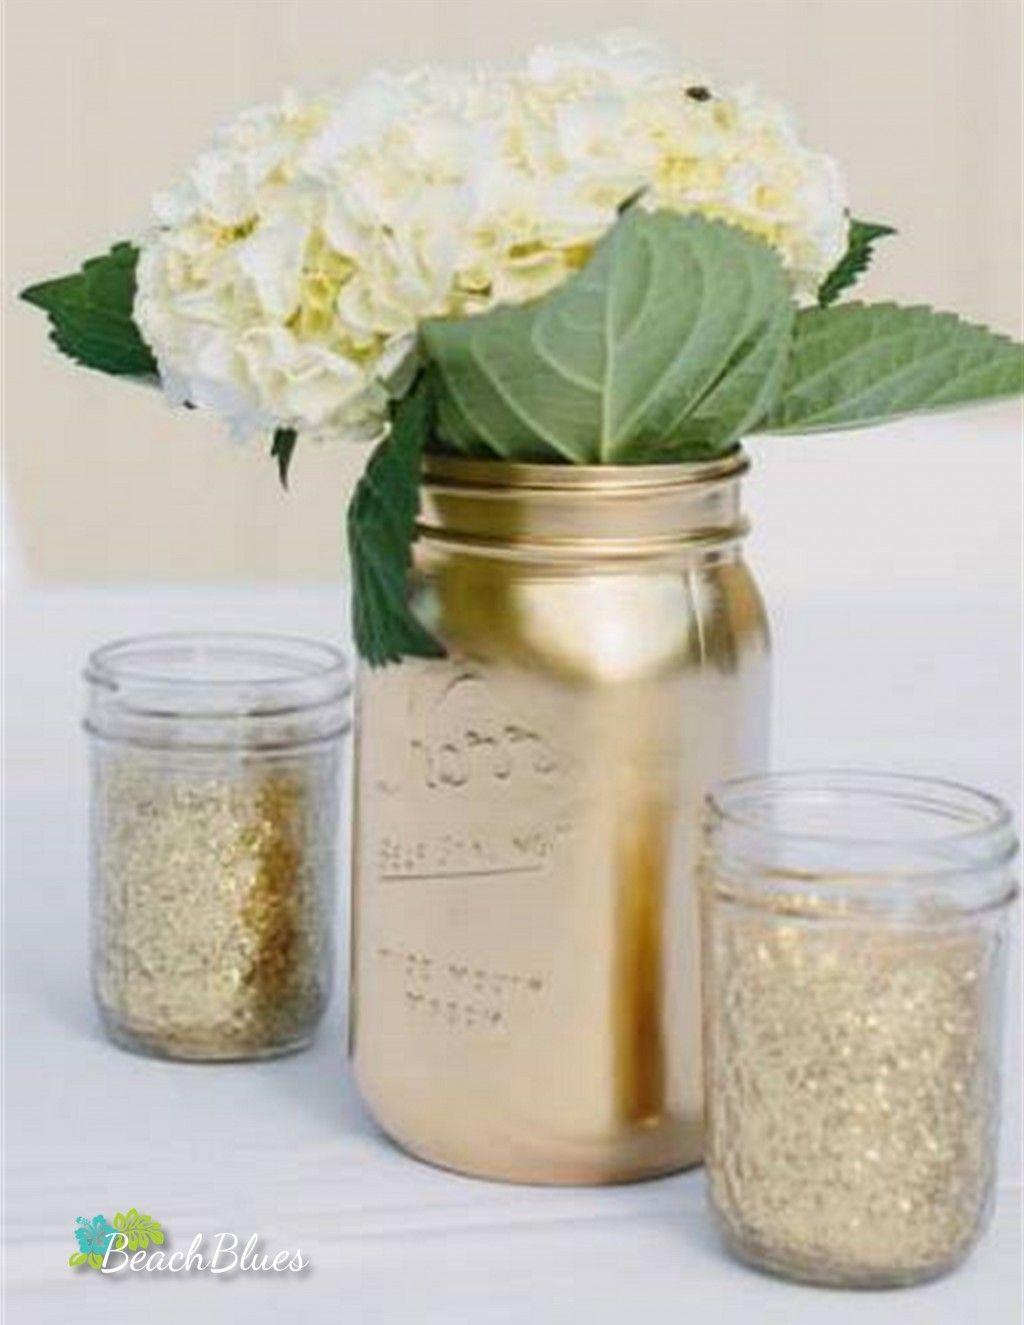 Pin by Brenda Gavin on Wedding   Pinterest   Jar, Bridal bouquets ...